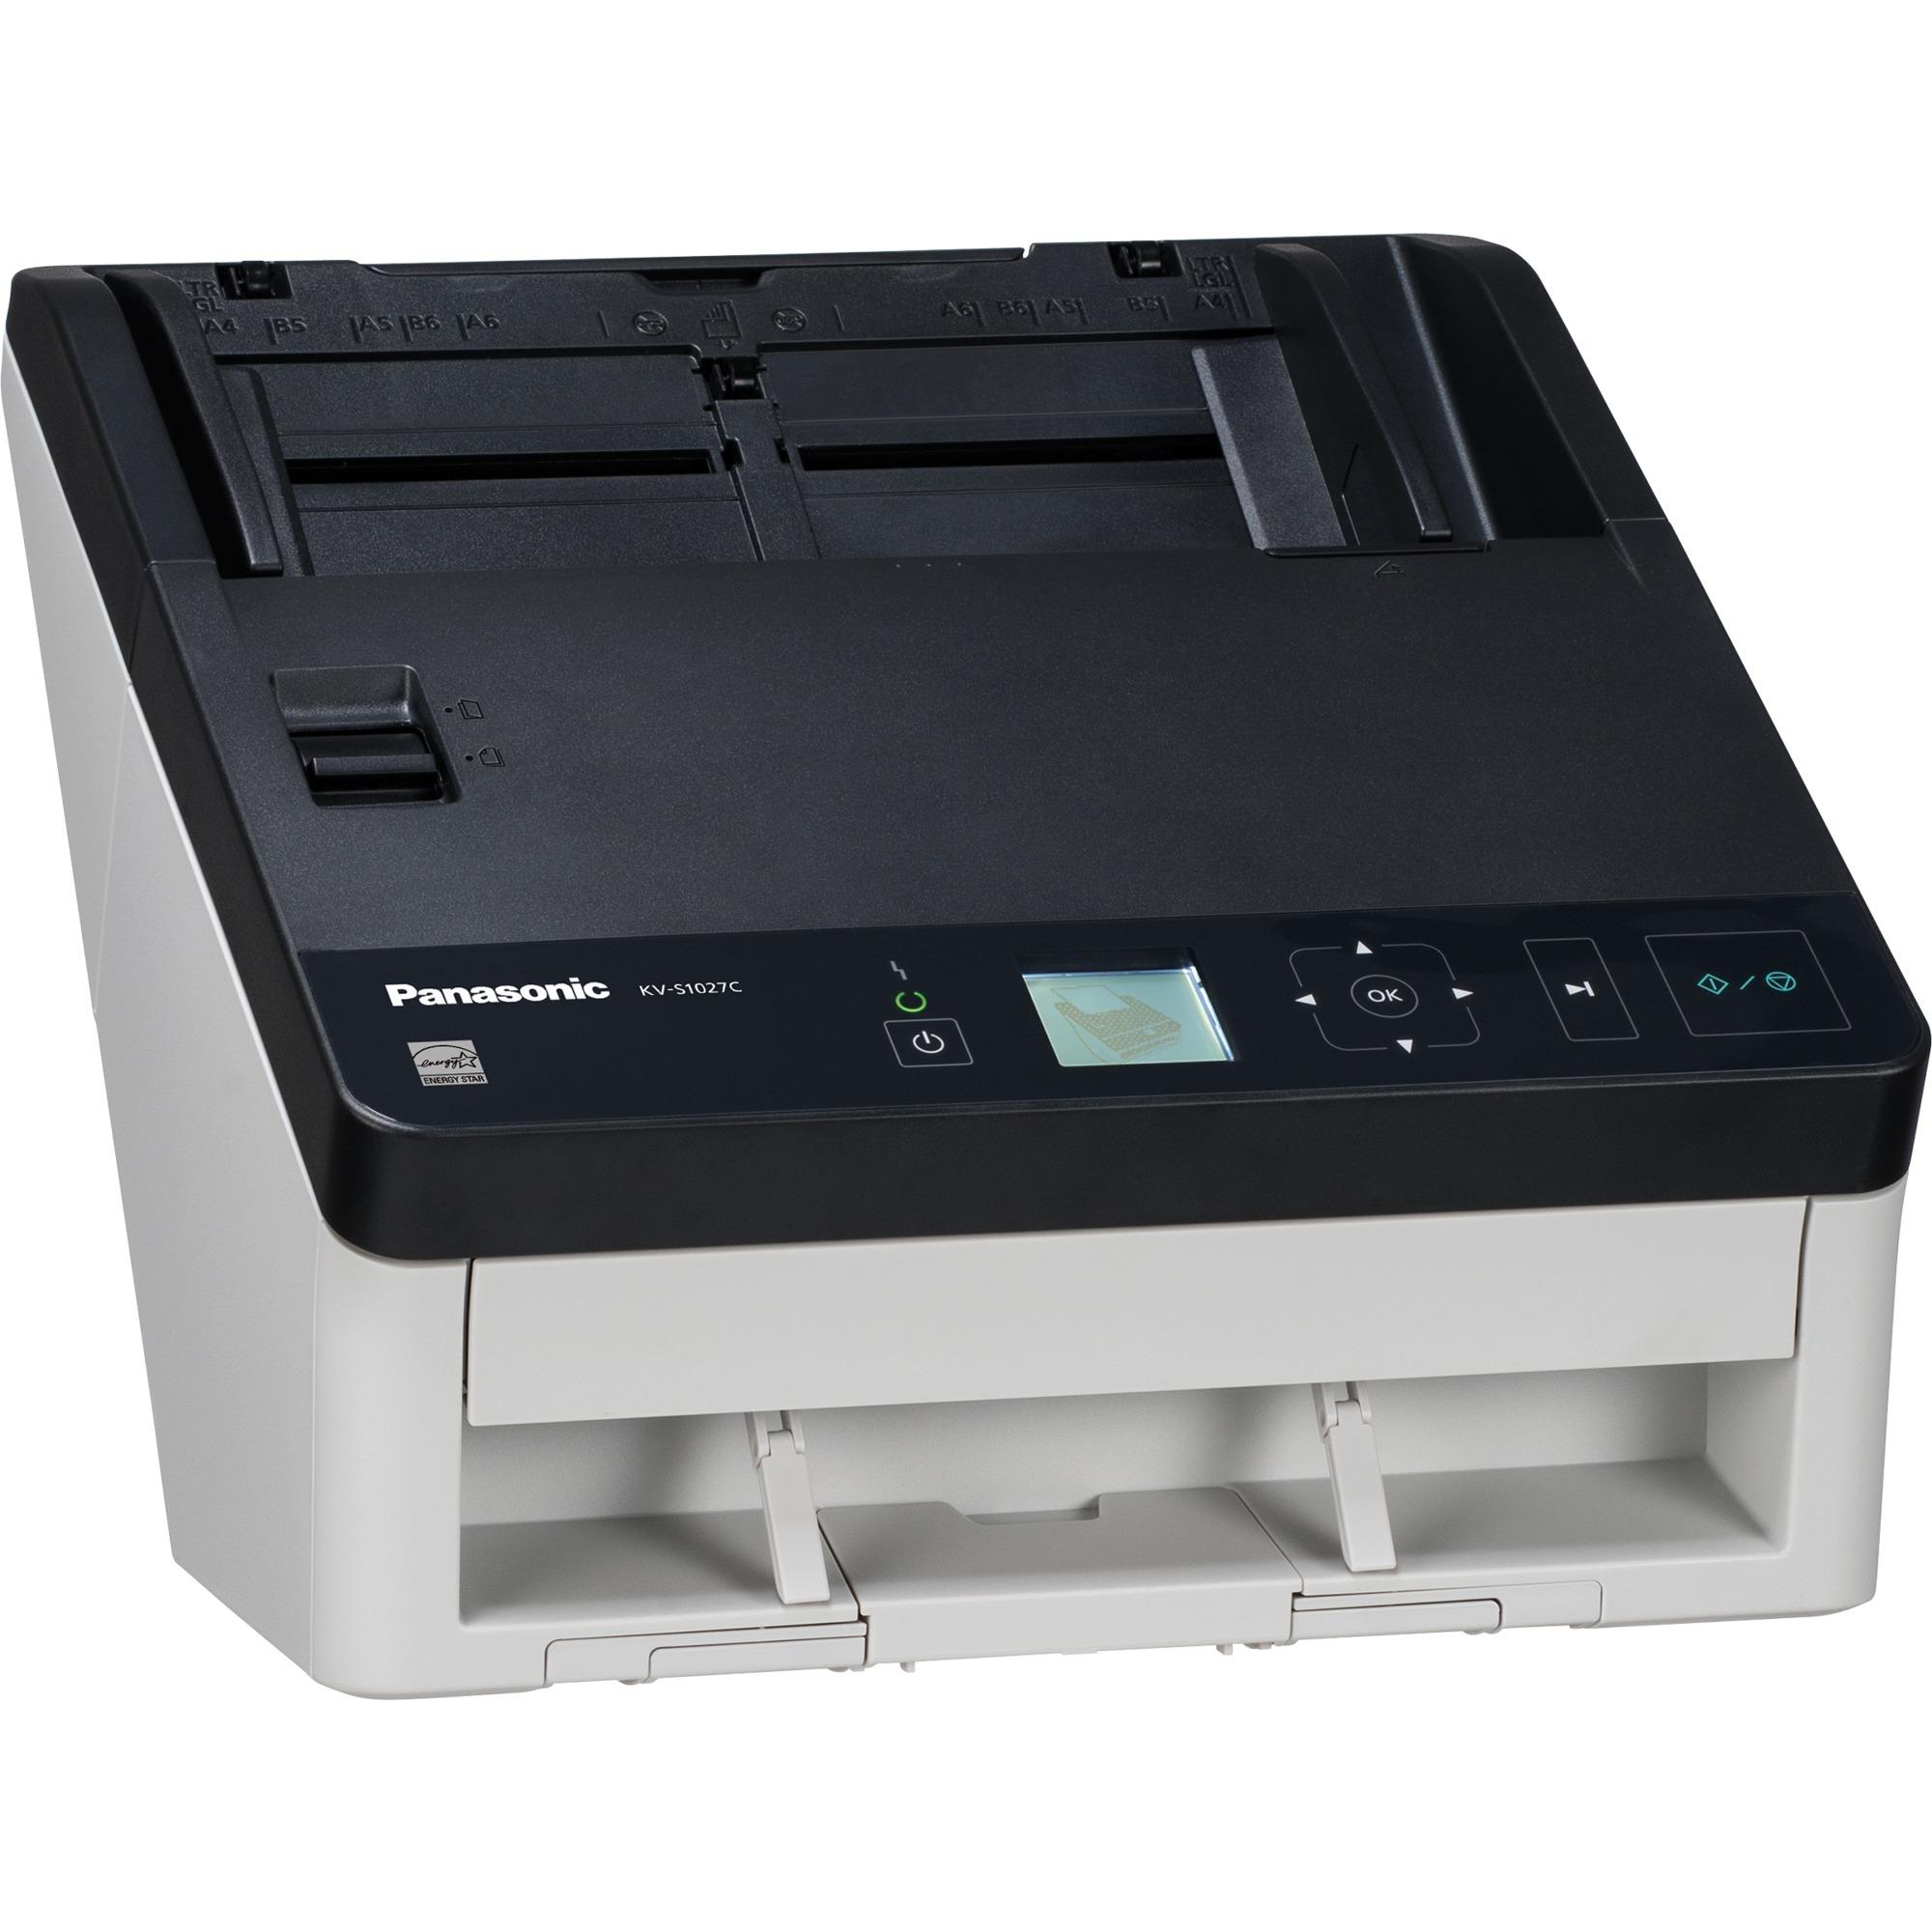 KV-S1027C-U ADF scanner 300 x 600DPI A4 Noir, Blanc scanner